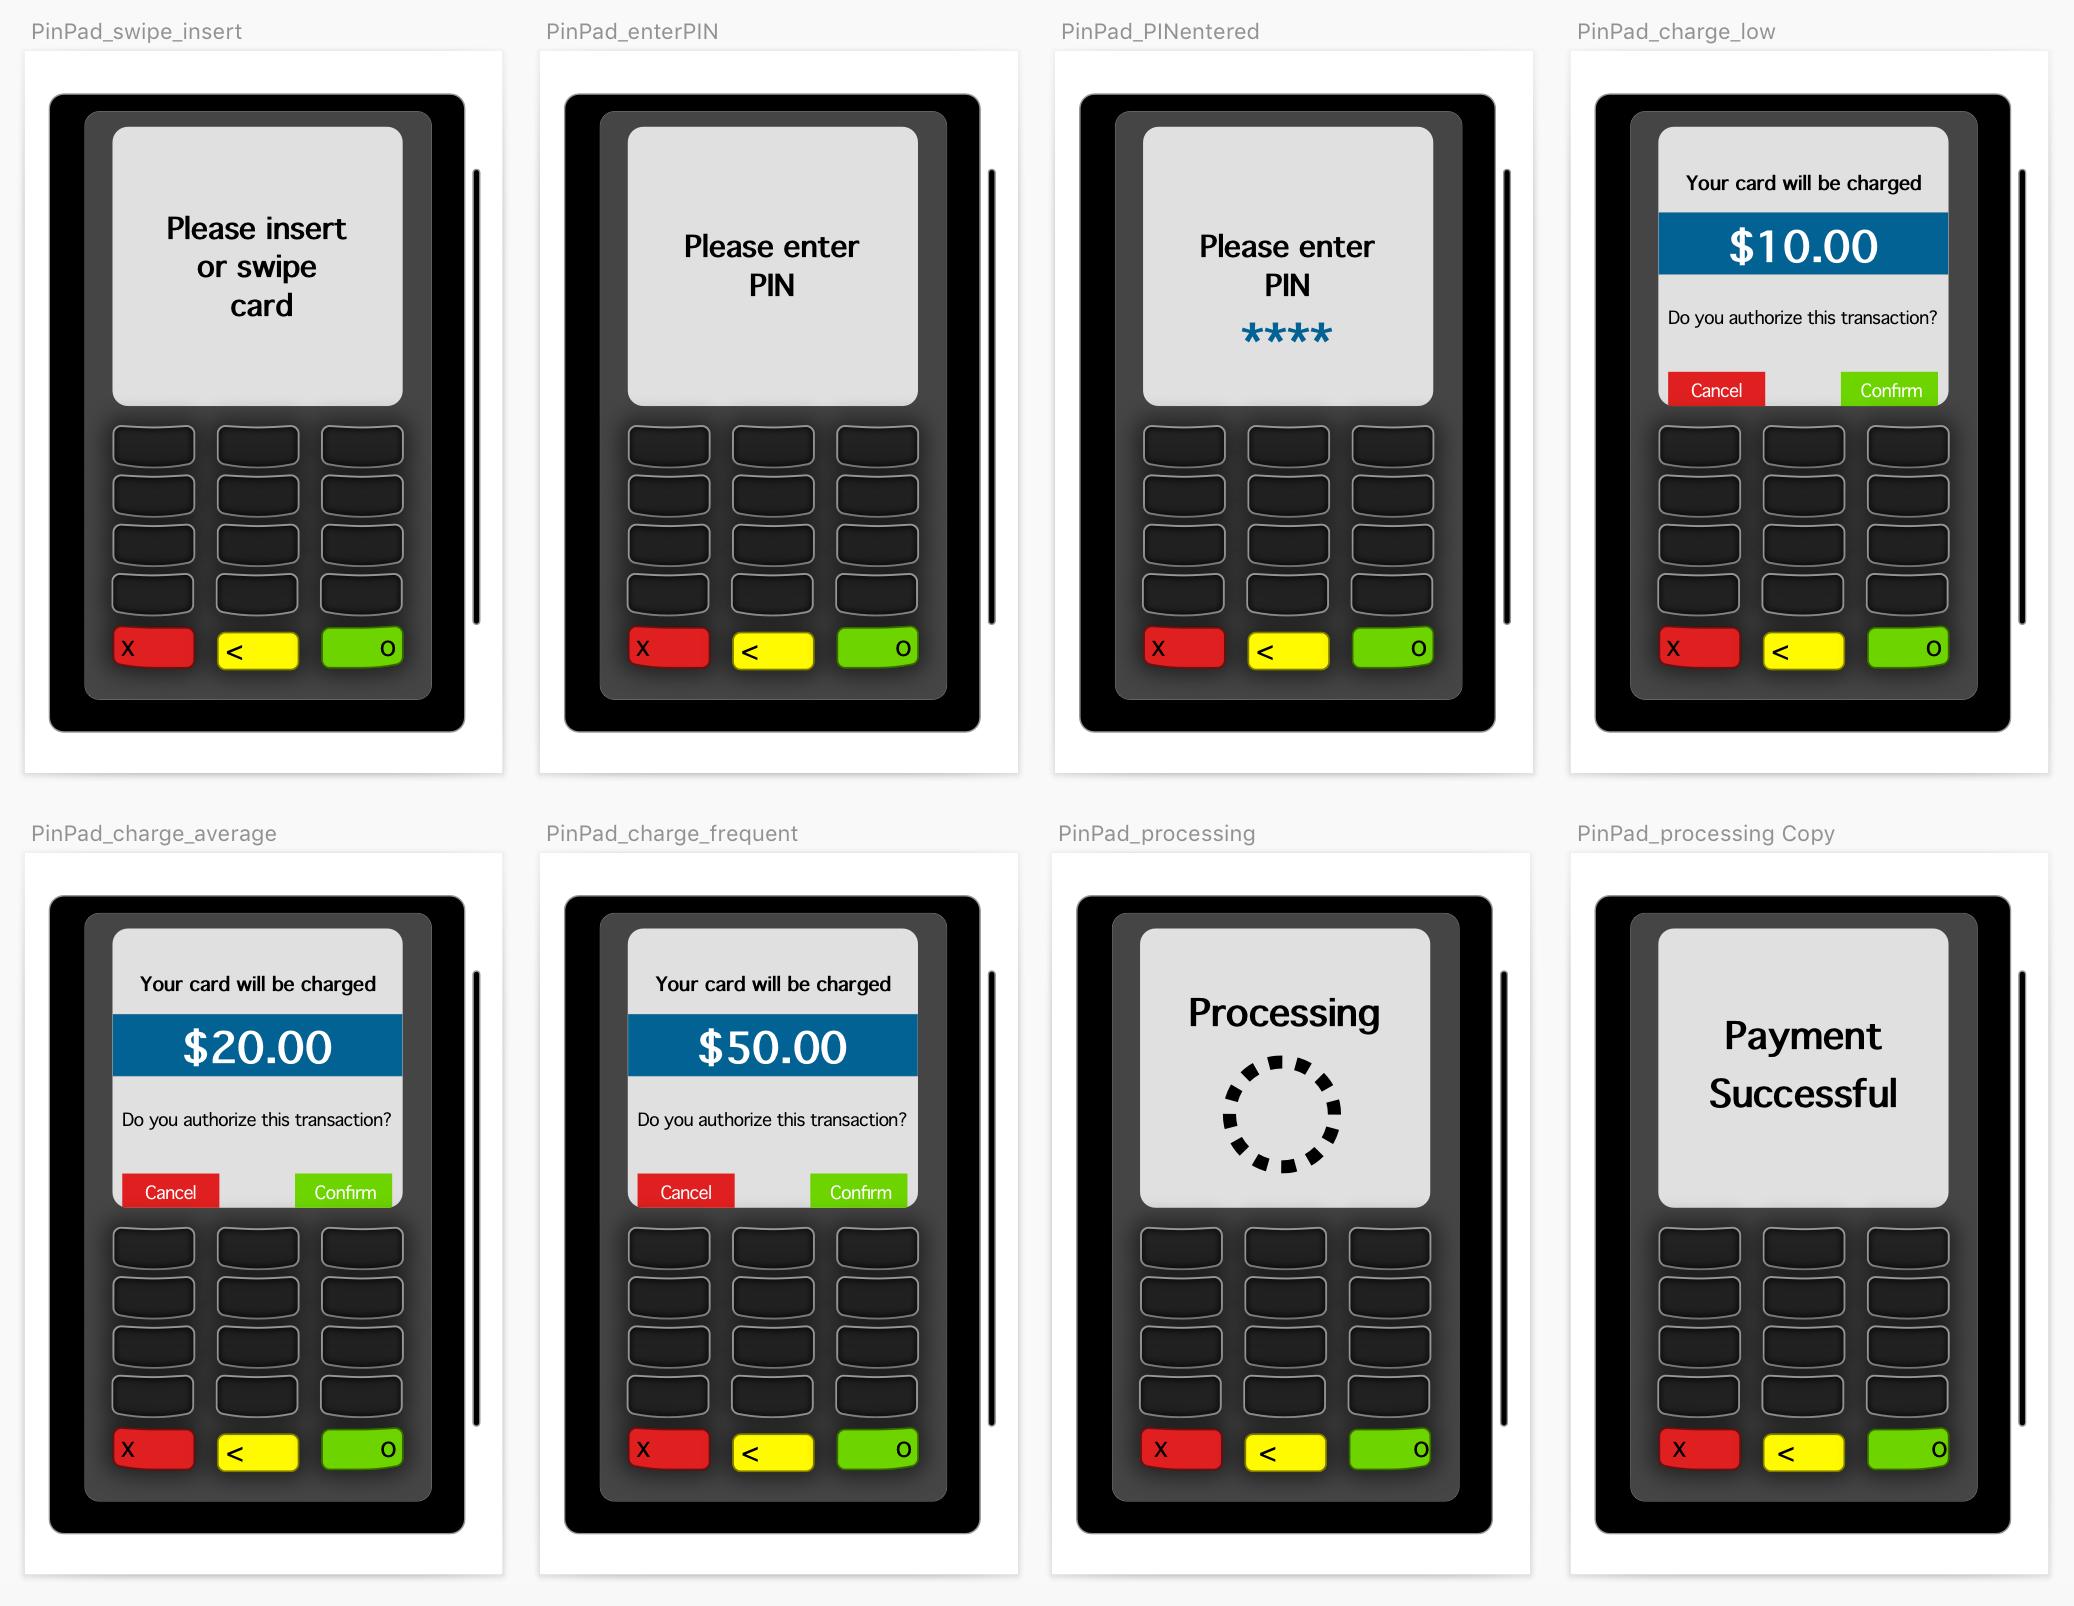 Image of all hi-fi pin pads